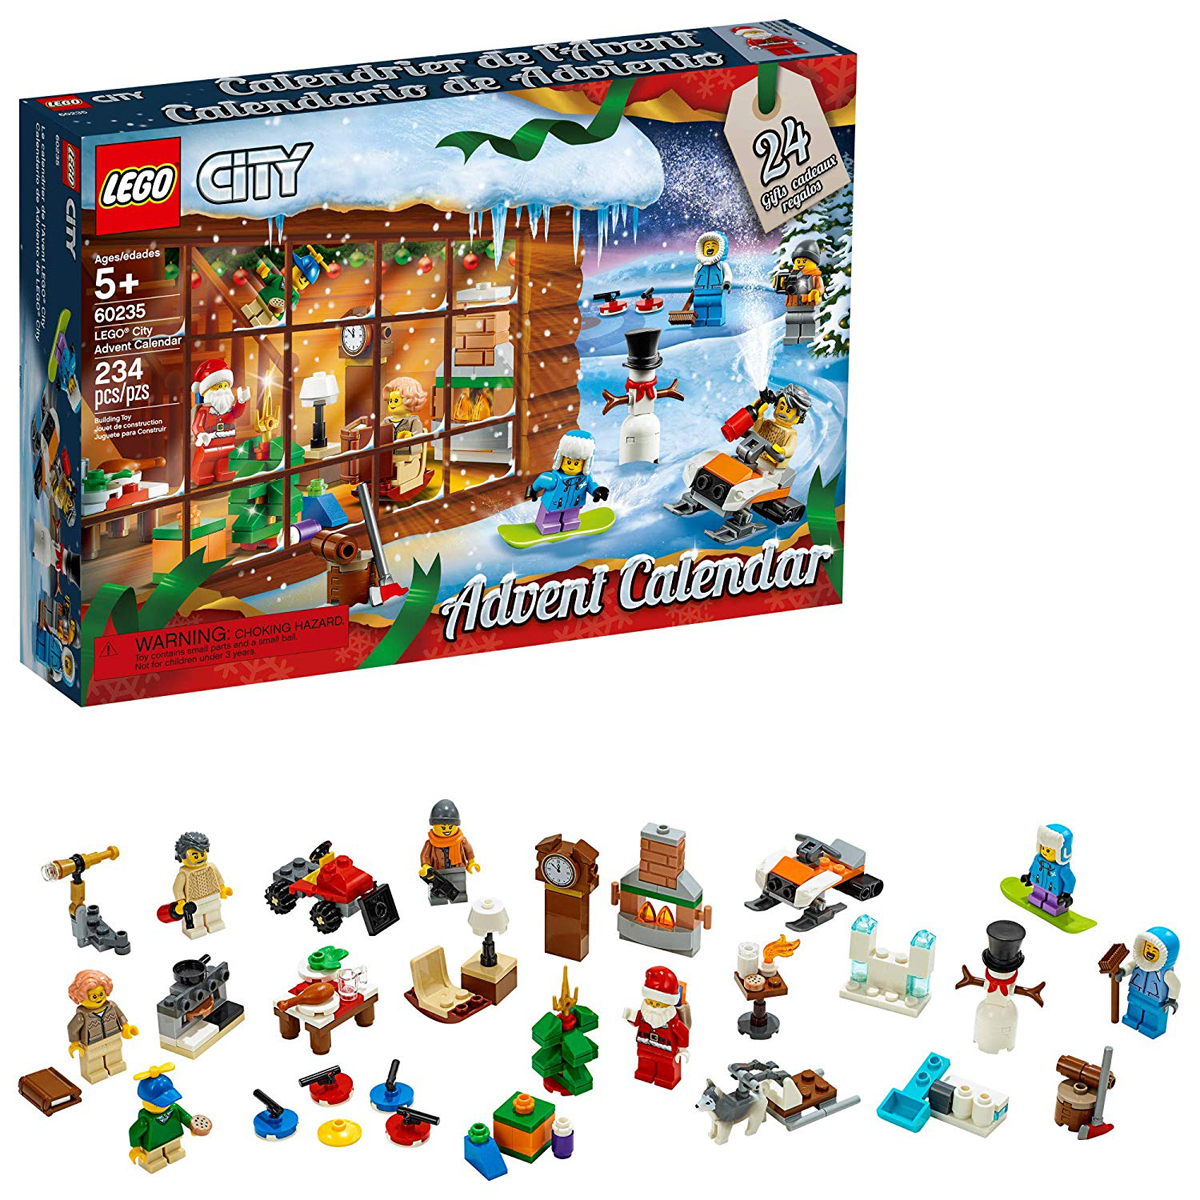 World Of Tanks Advent Calendar 2020.2019 Lego Advent Calendars Now Available For Pre Order Via Amazon